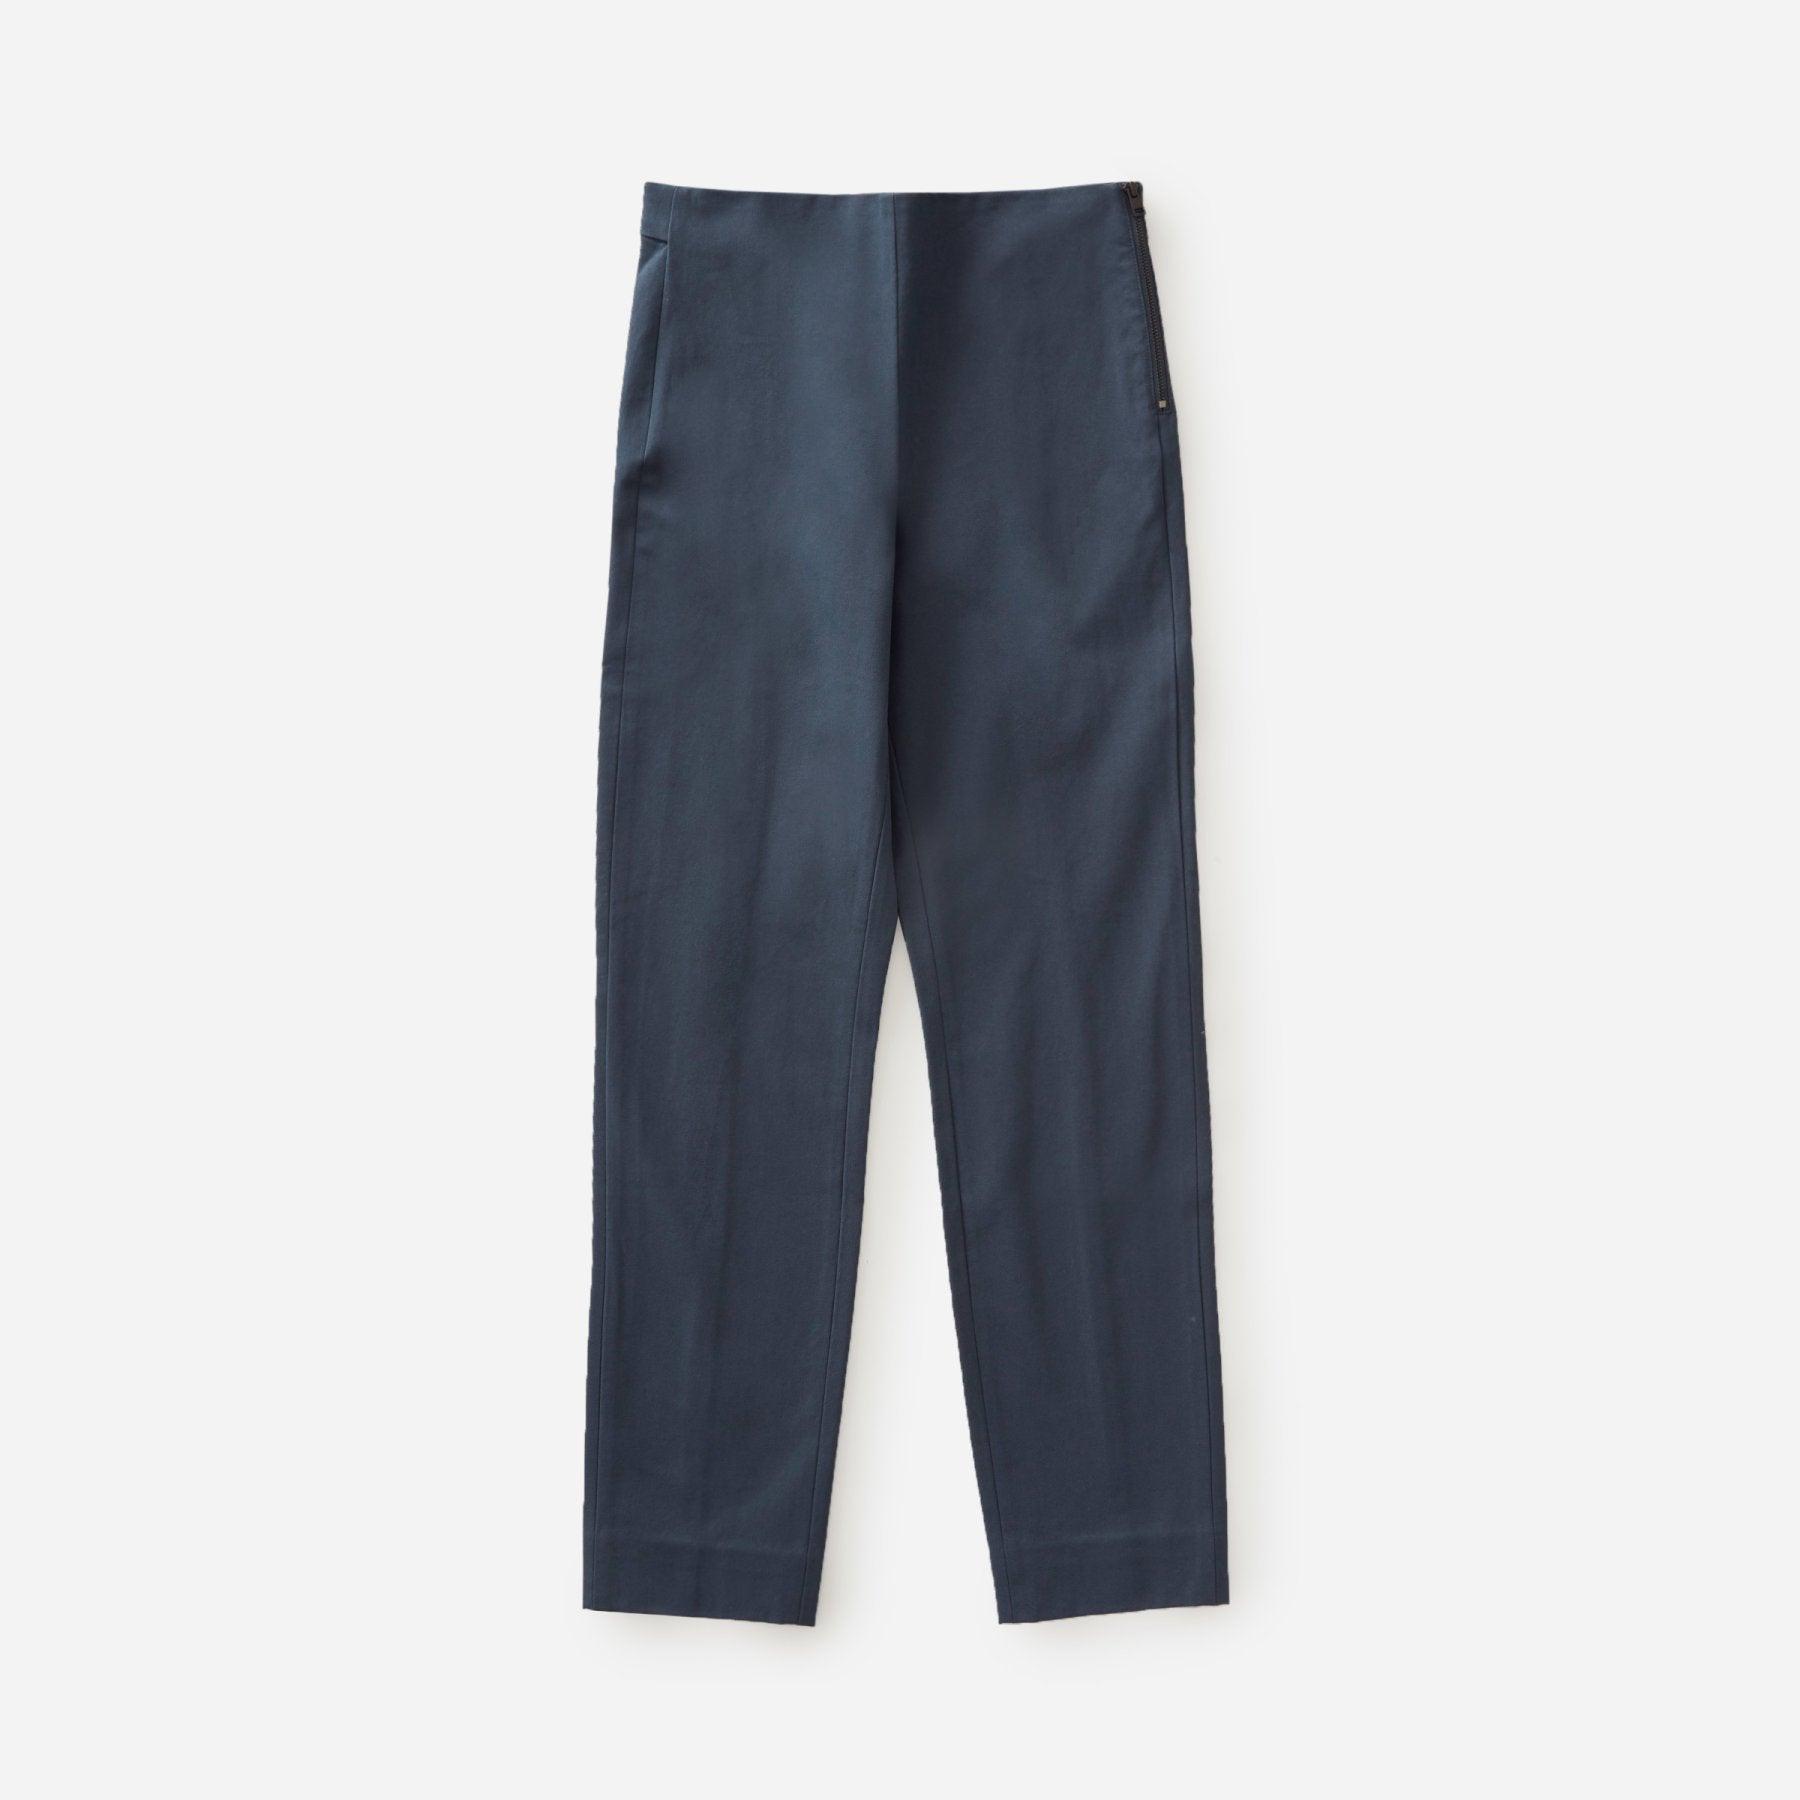 b9cbd44a3b3 Universal Standard + Moro Pocket Ponte Pants